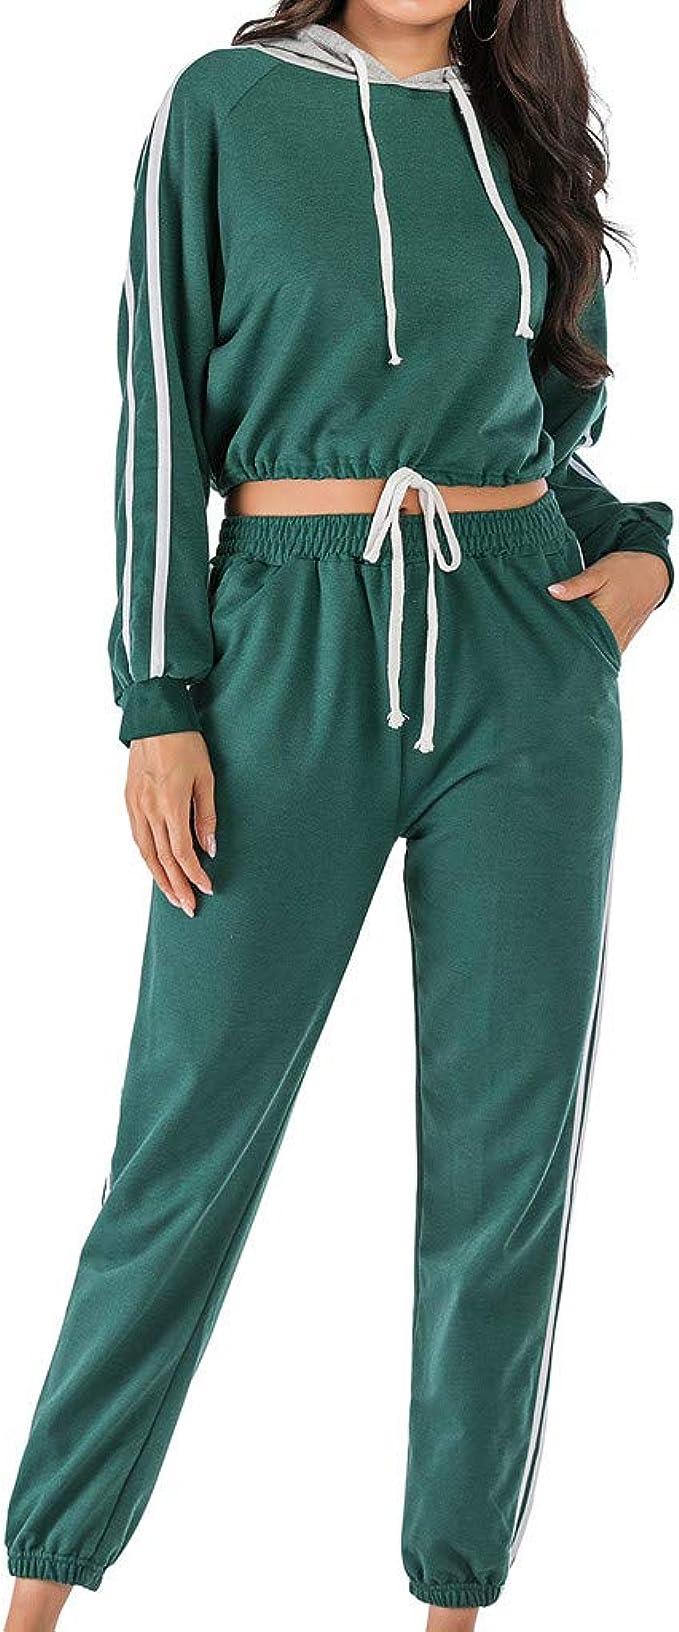 ABCone - Chándal de Gimnasia para Mujer con Capucha + Pantalones ...